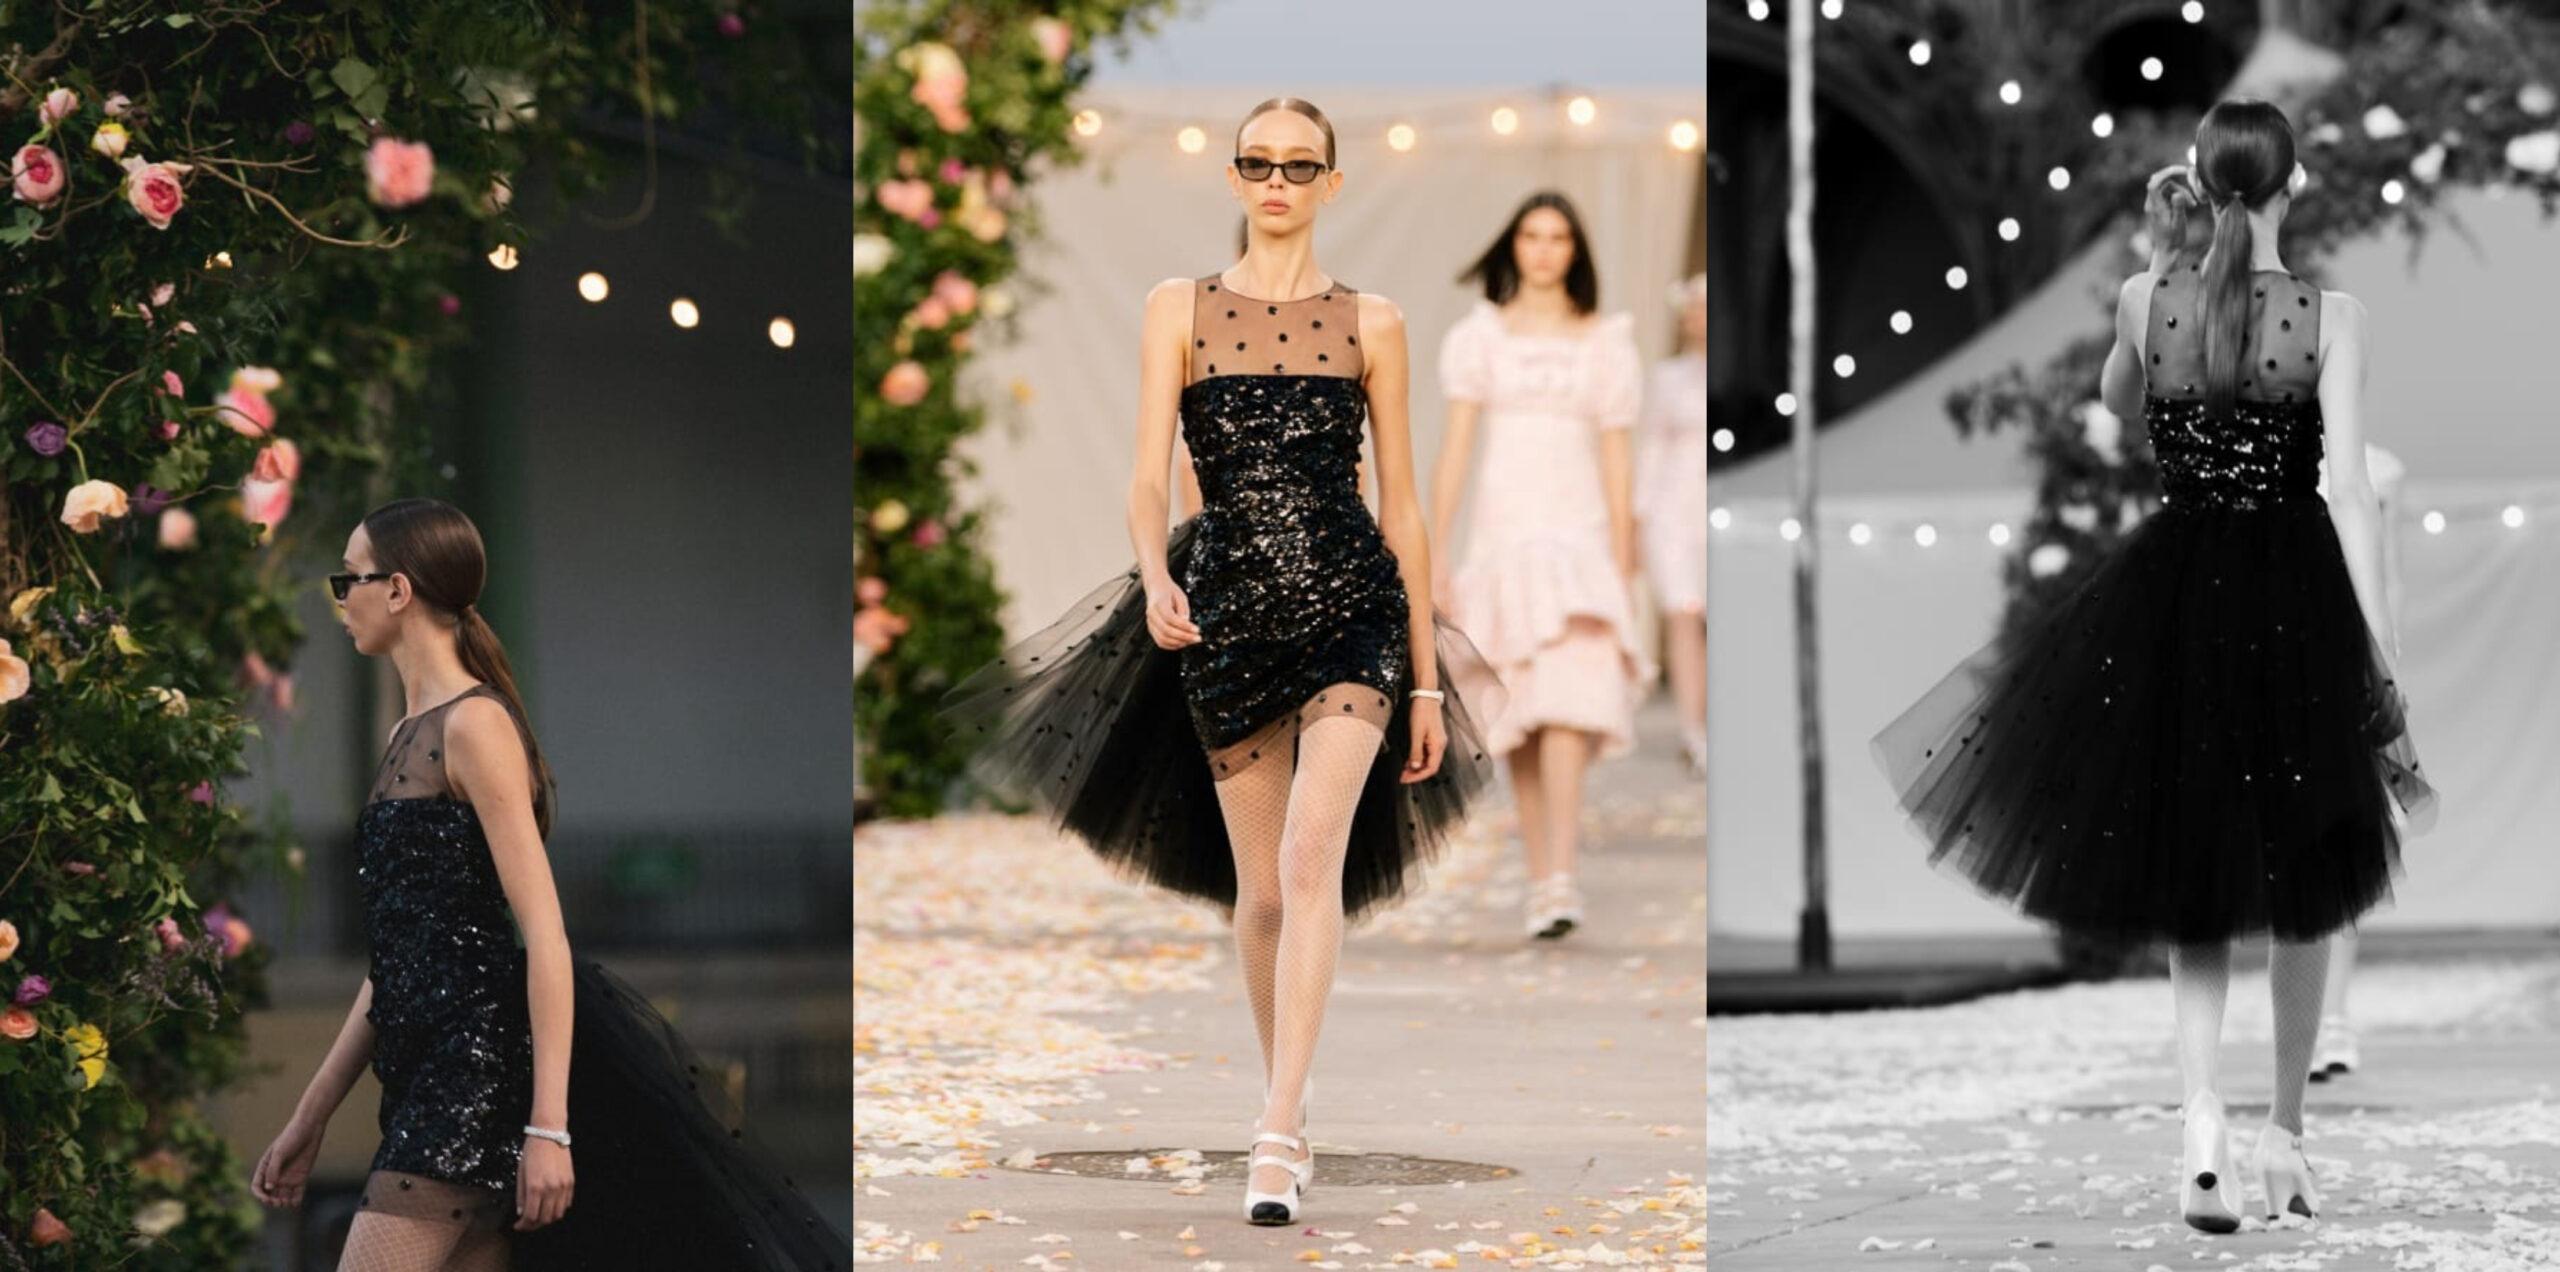 Moira Berntz, la modelo argentina favorita de Chanel